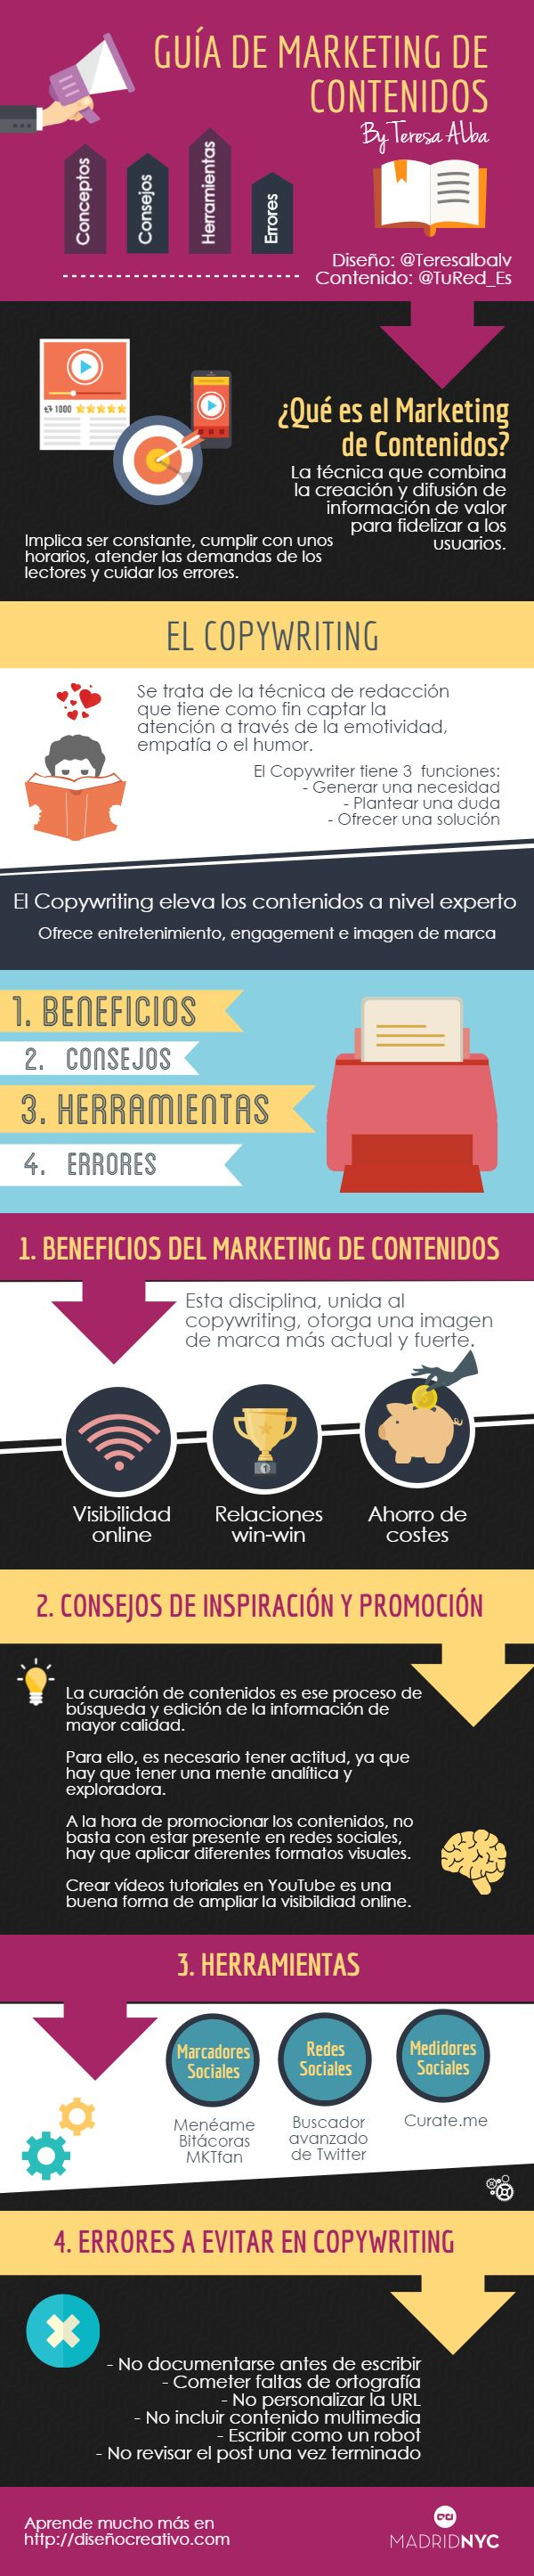 GUÍA DE MARKETING DE CONTENIDOS #INFOGRAFIA #INFOGRAPHIC #MARKETING